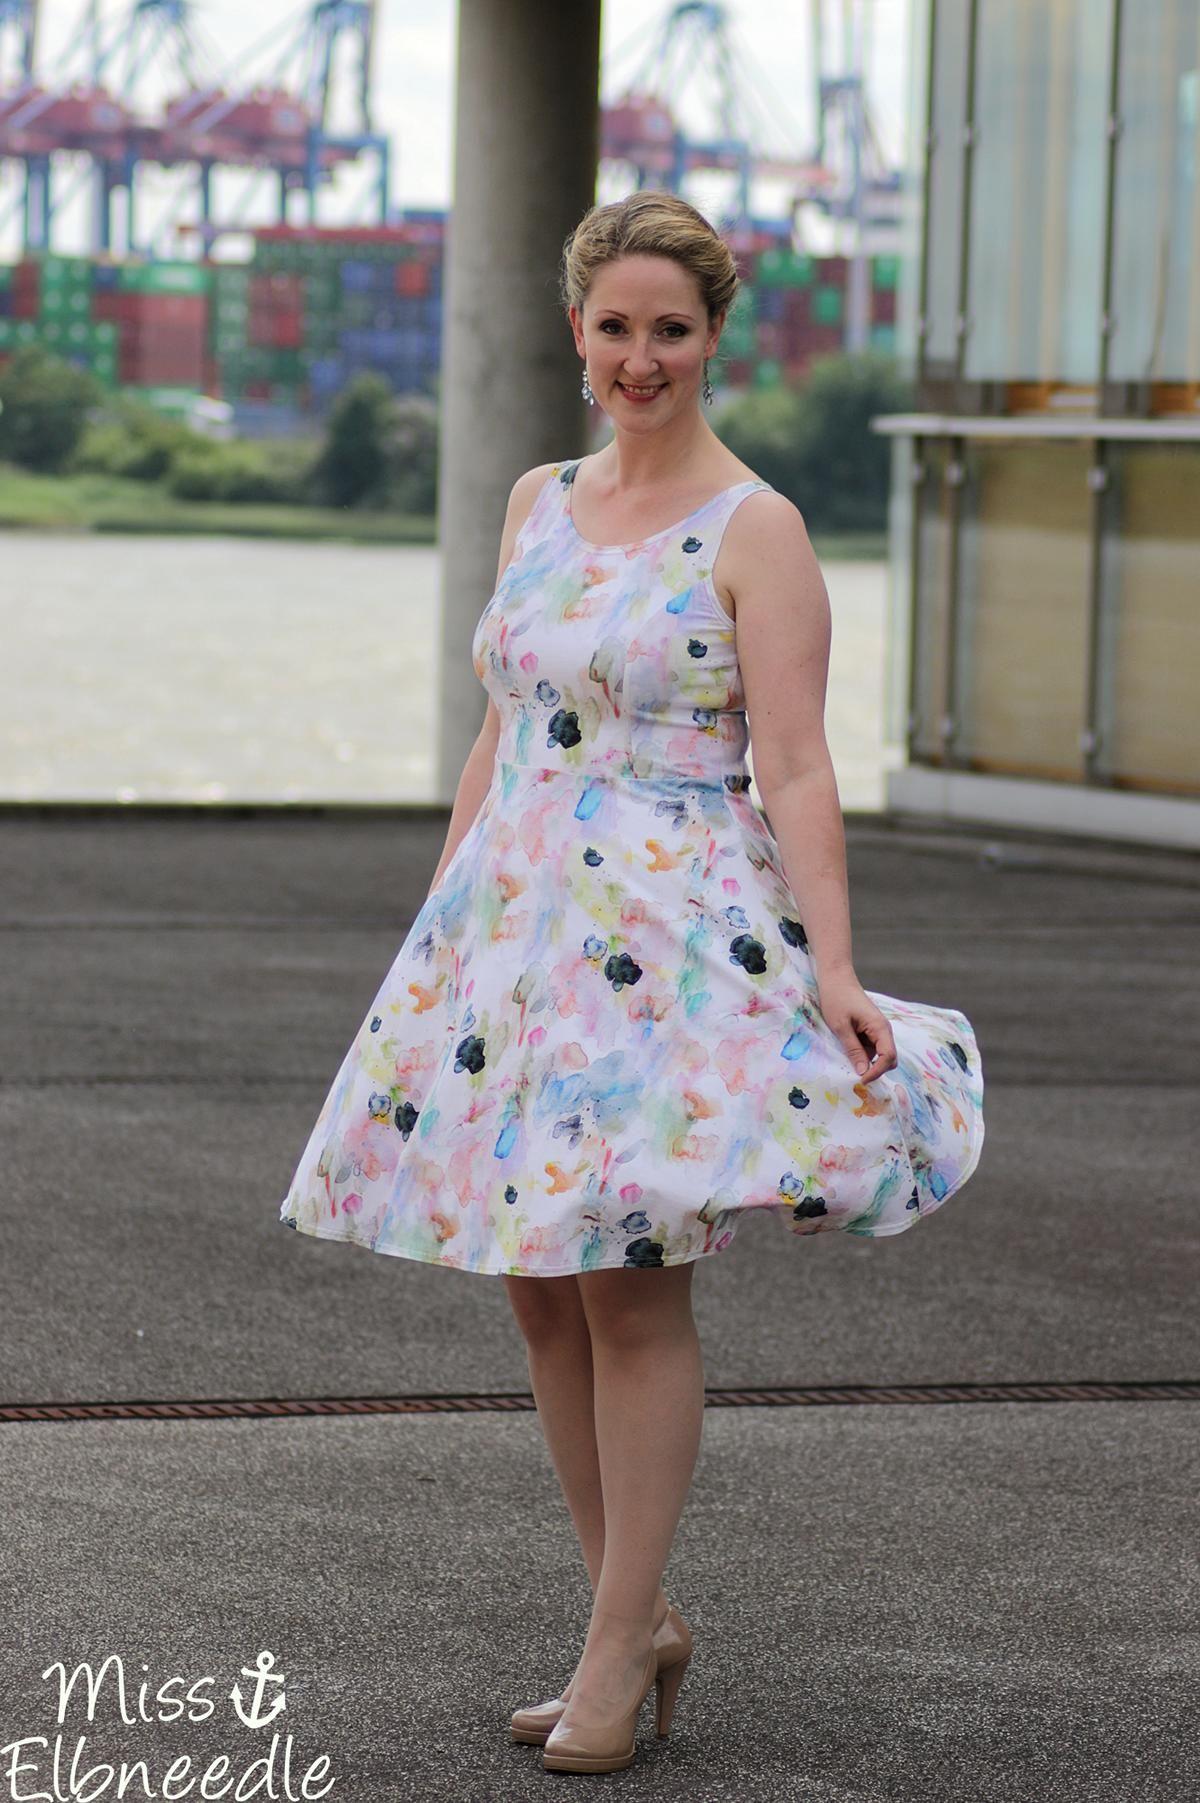 Miss_Elbneedle #Fashion #Elbe #Pastell #Kleid #Dress #Summerdress